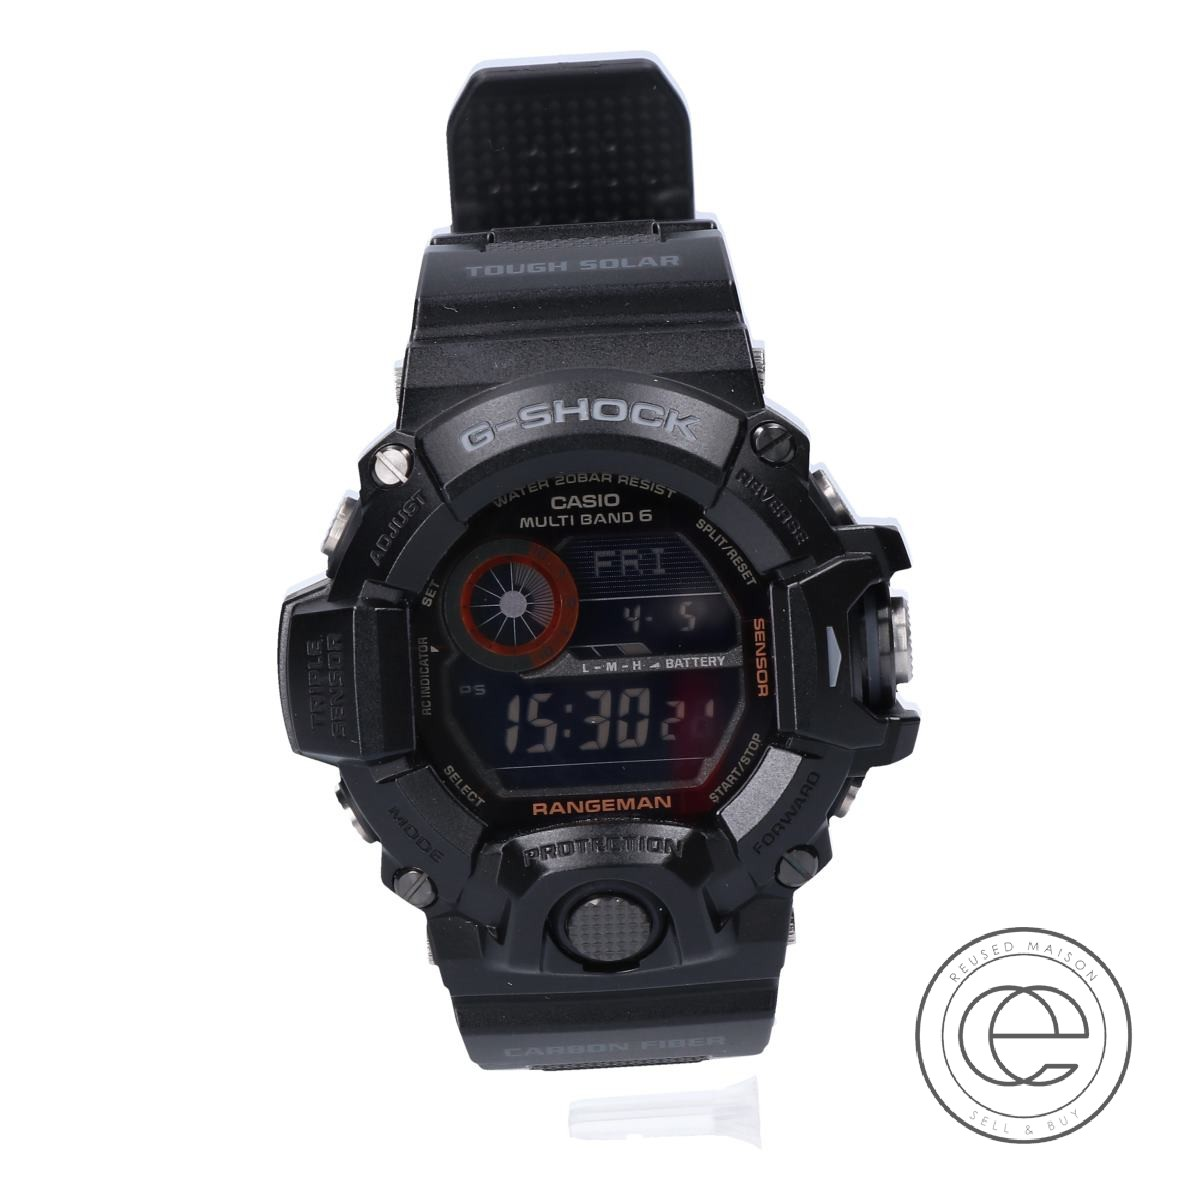 G-SHOCKジーショック GW-9400BJ-1JF RANGEMANレンジマン マルチバンド6 タフソーラー電波腕時計 ブラック メンズ 【中古】